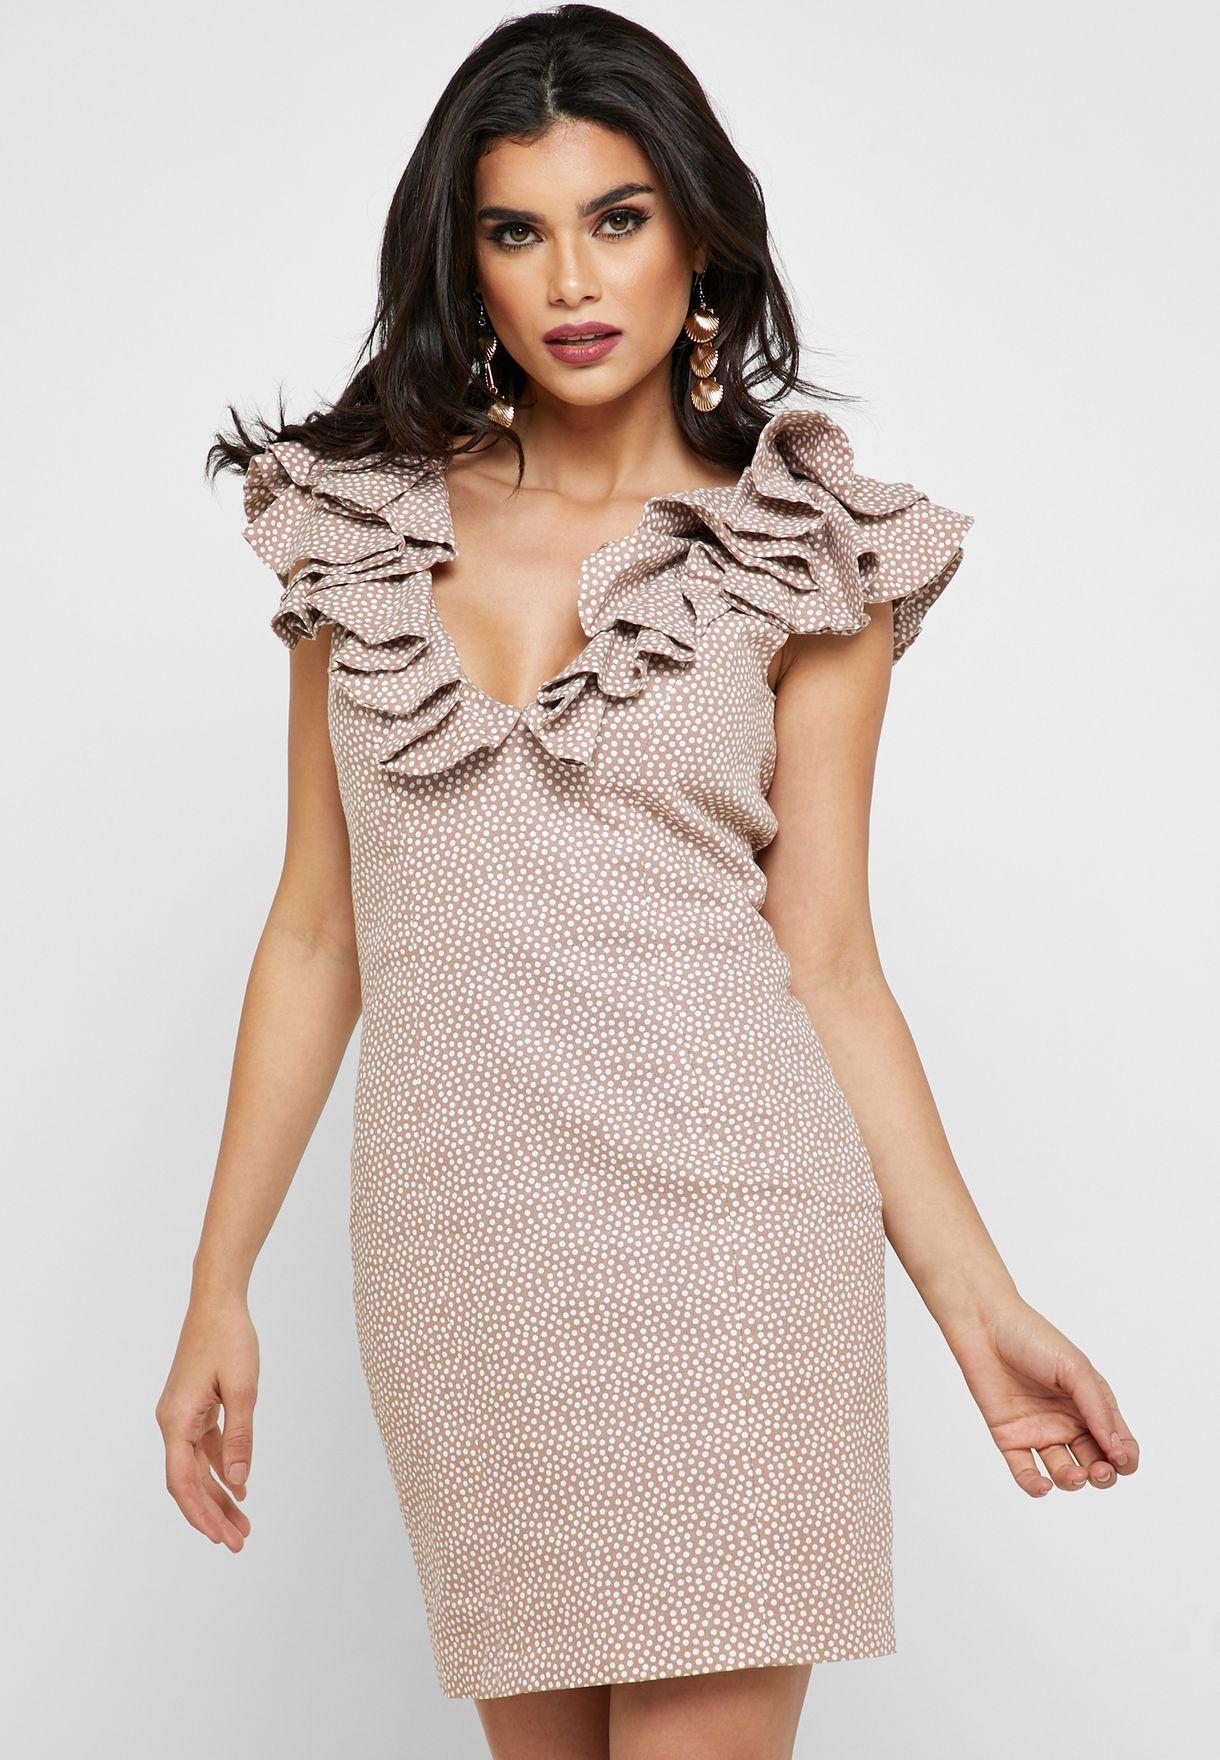 Ruffle Detail Bodycon Mini Dress